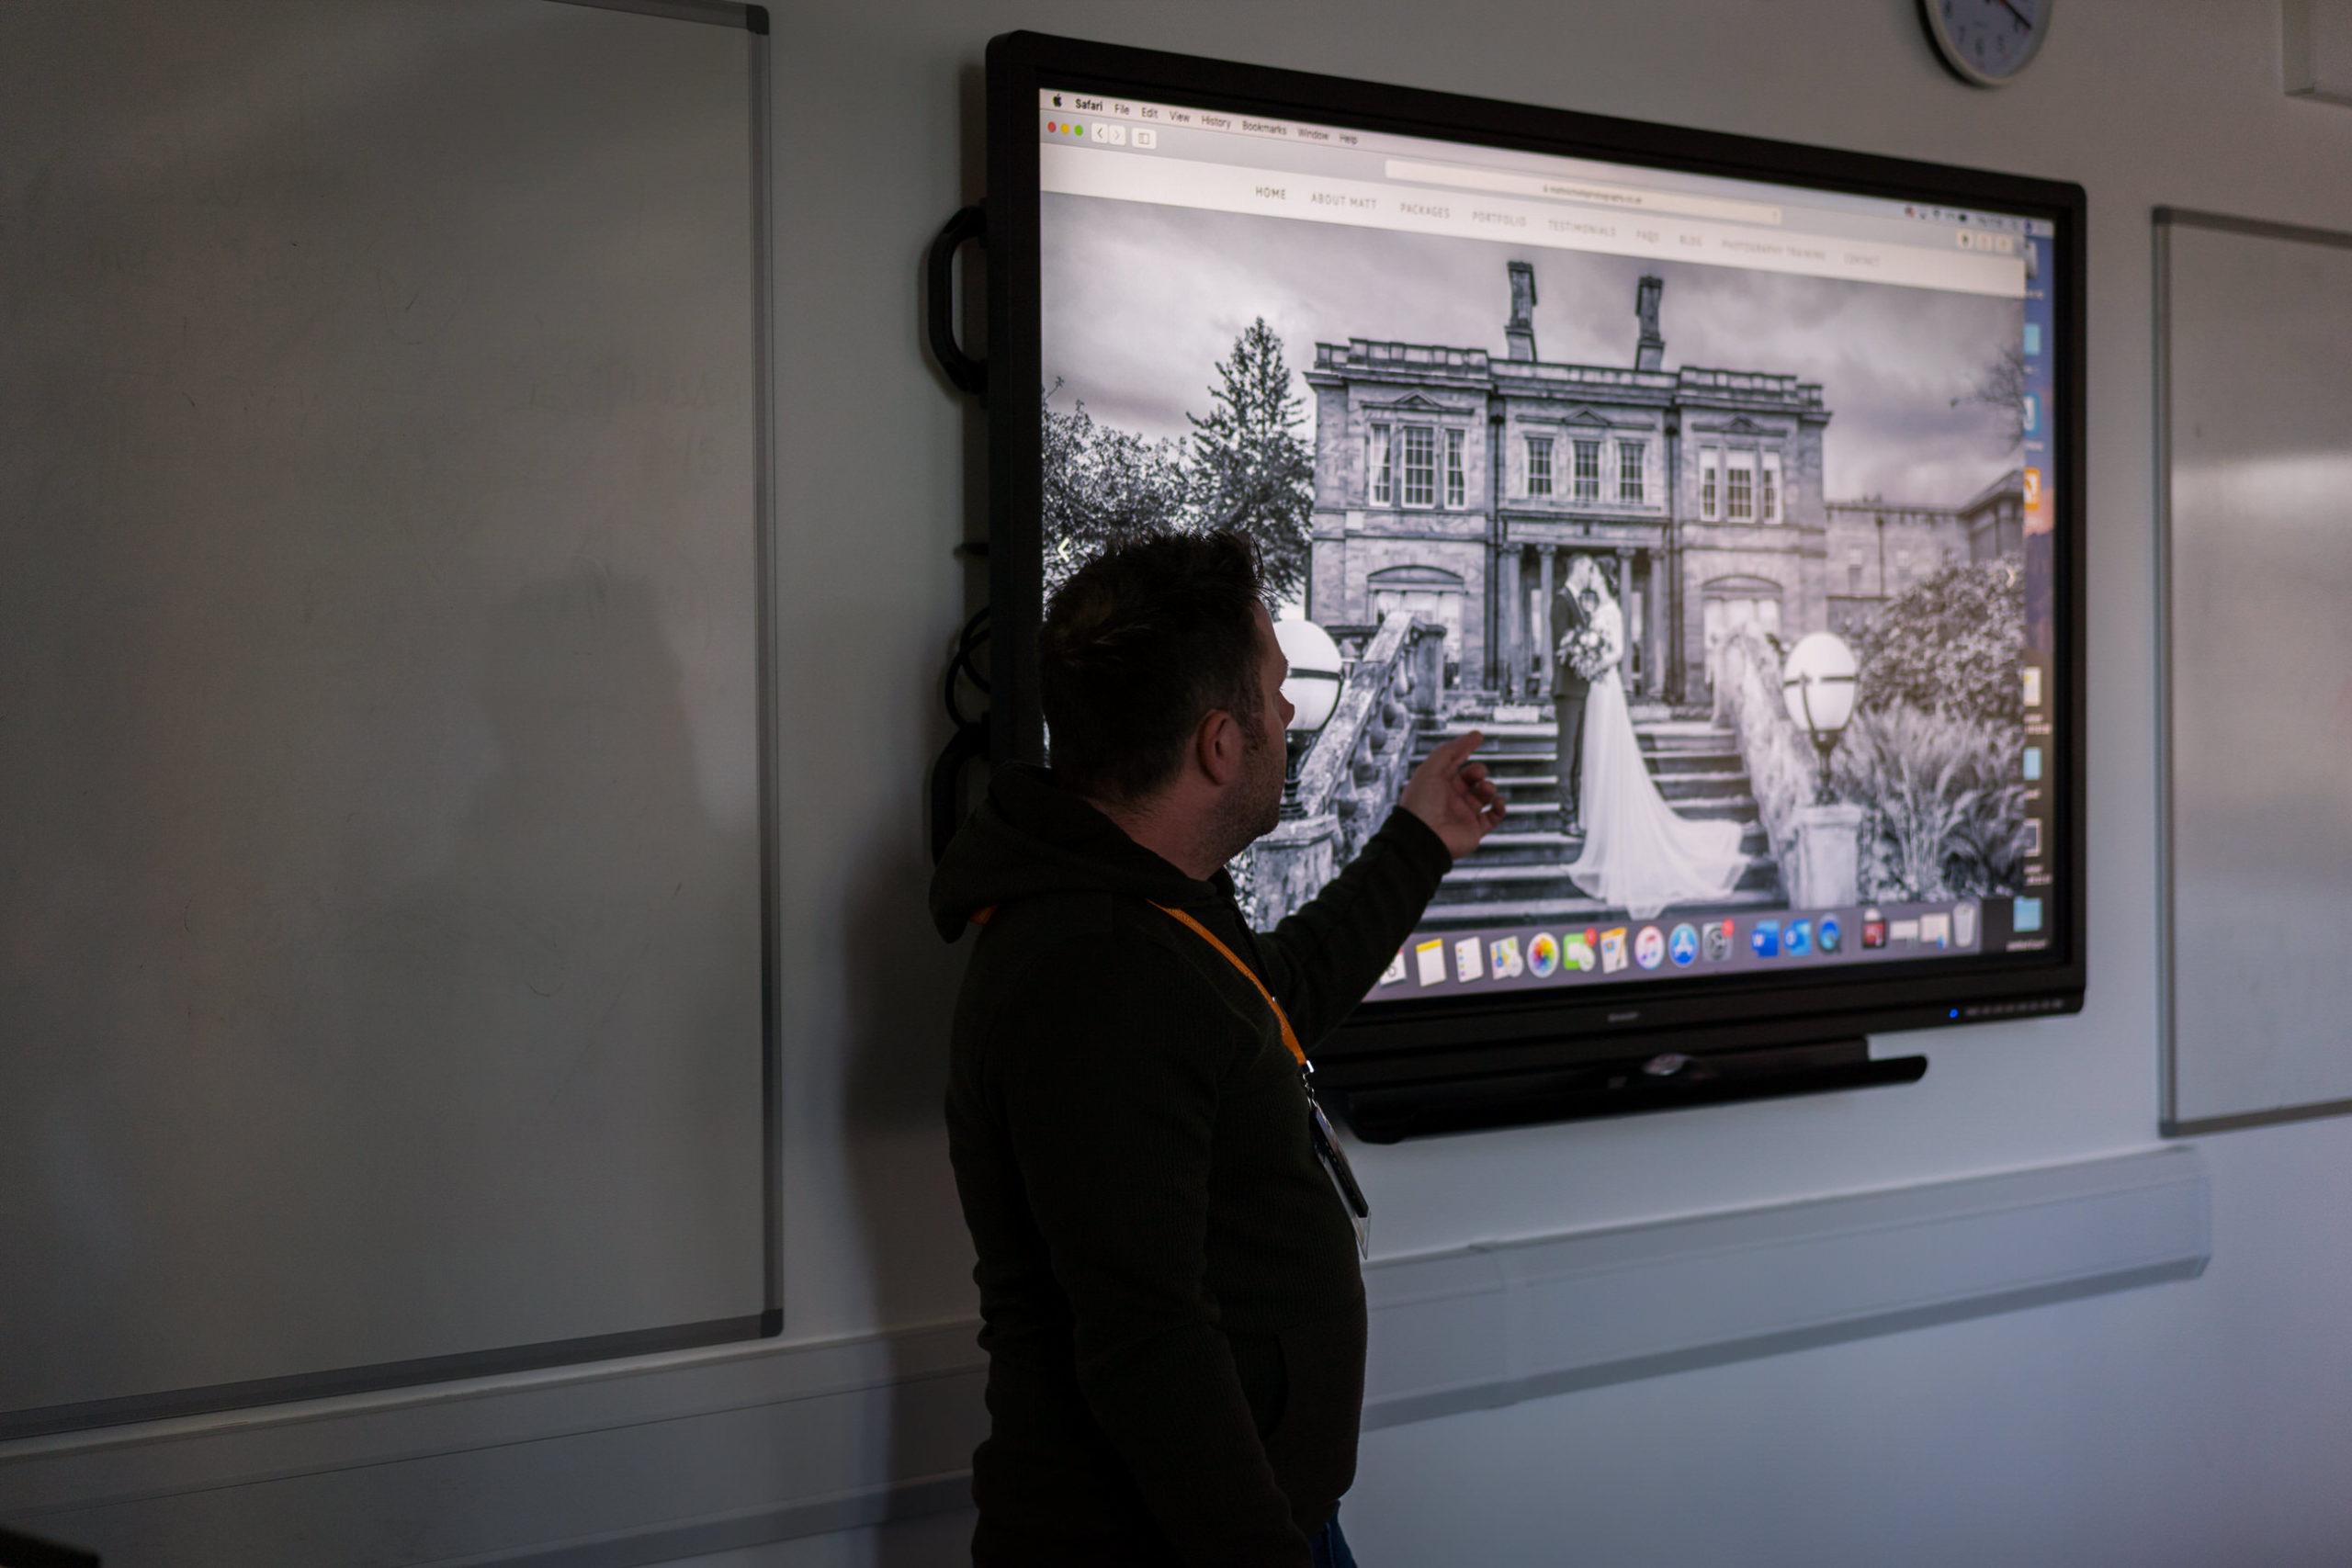 Matt Nicholls Photography at Leeds City College